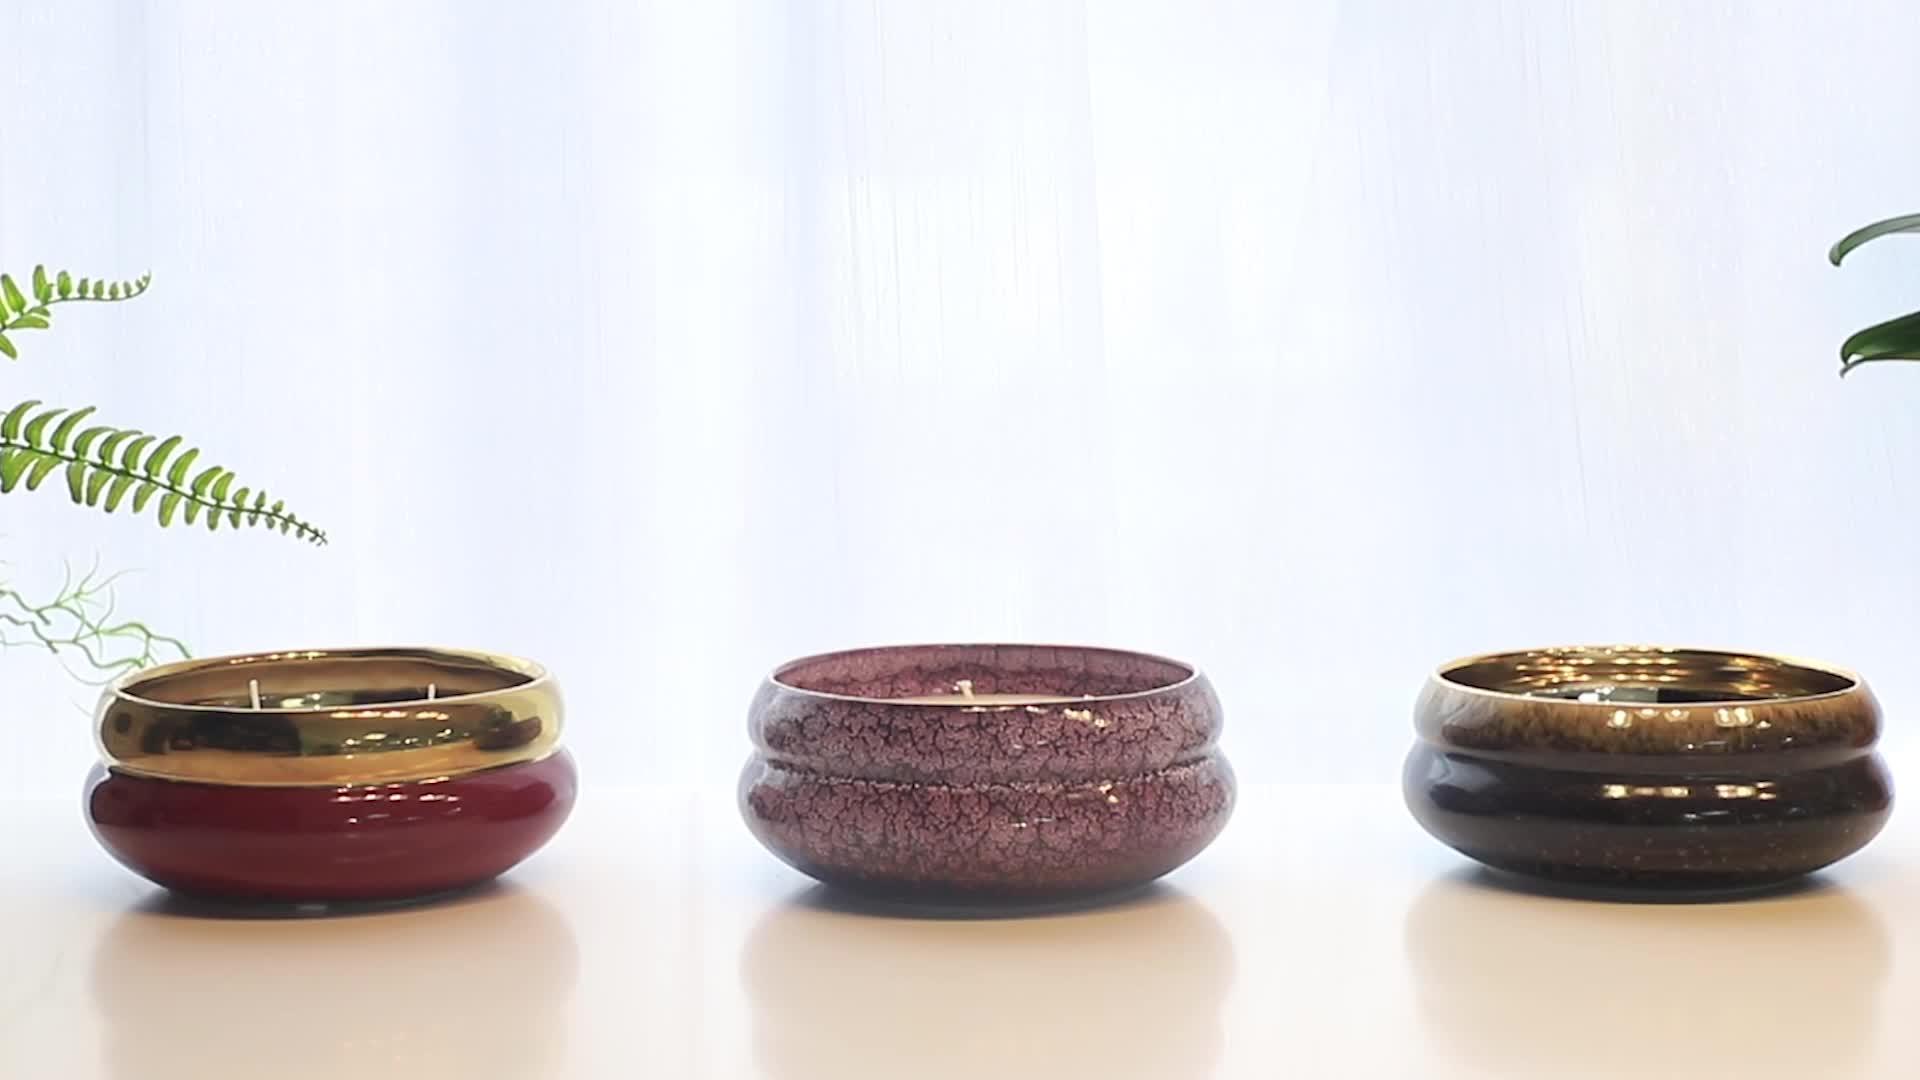 Sunny Glassware design 20oz luxury round curve  transmutation glaze ceramic candle holders